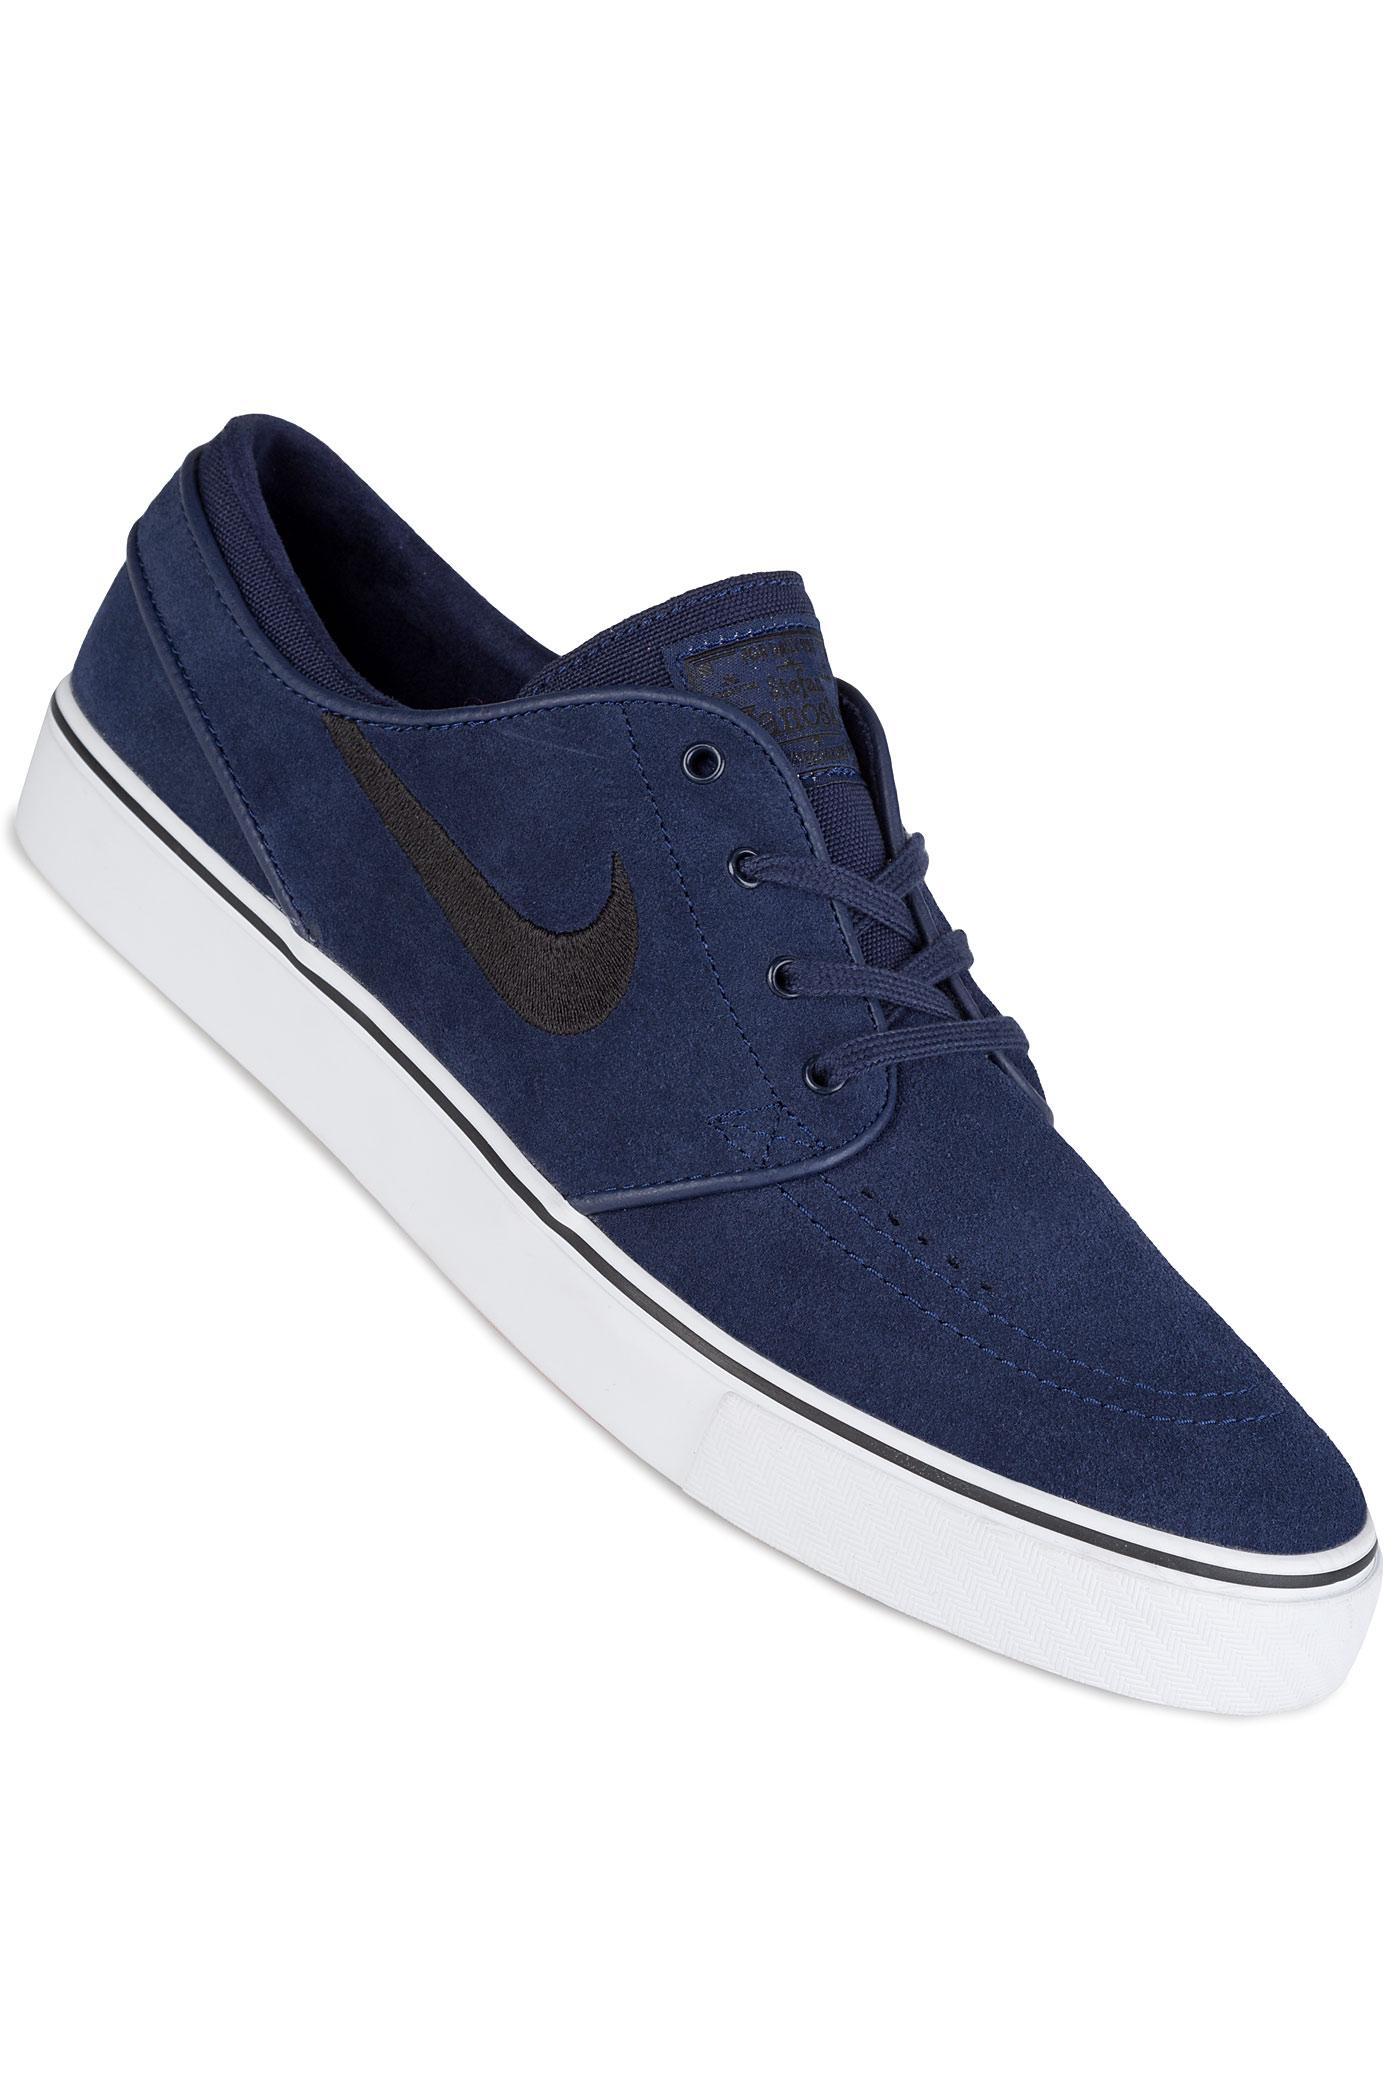 nike sb zoom stefan janoski chaussure binary blue black achetez sur skatedeluxe. Black Bedroom Furniture Sets. Home Design Ideas